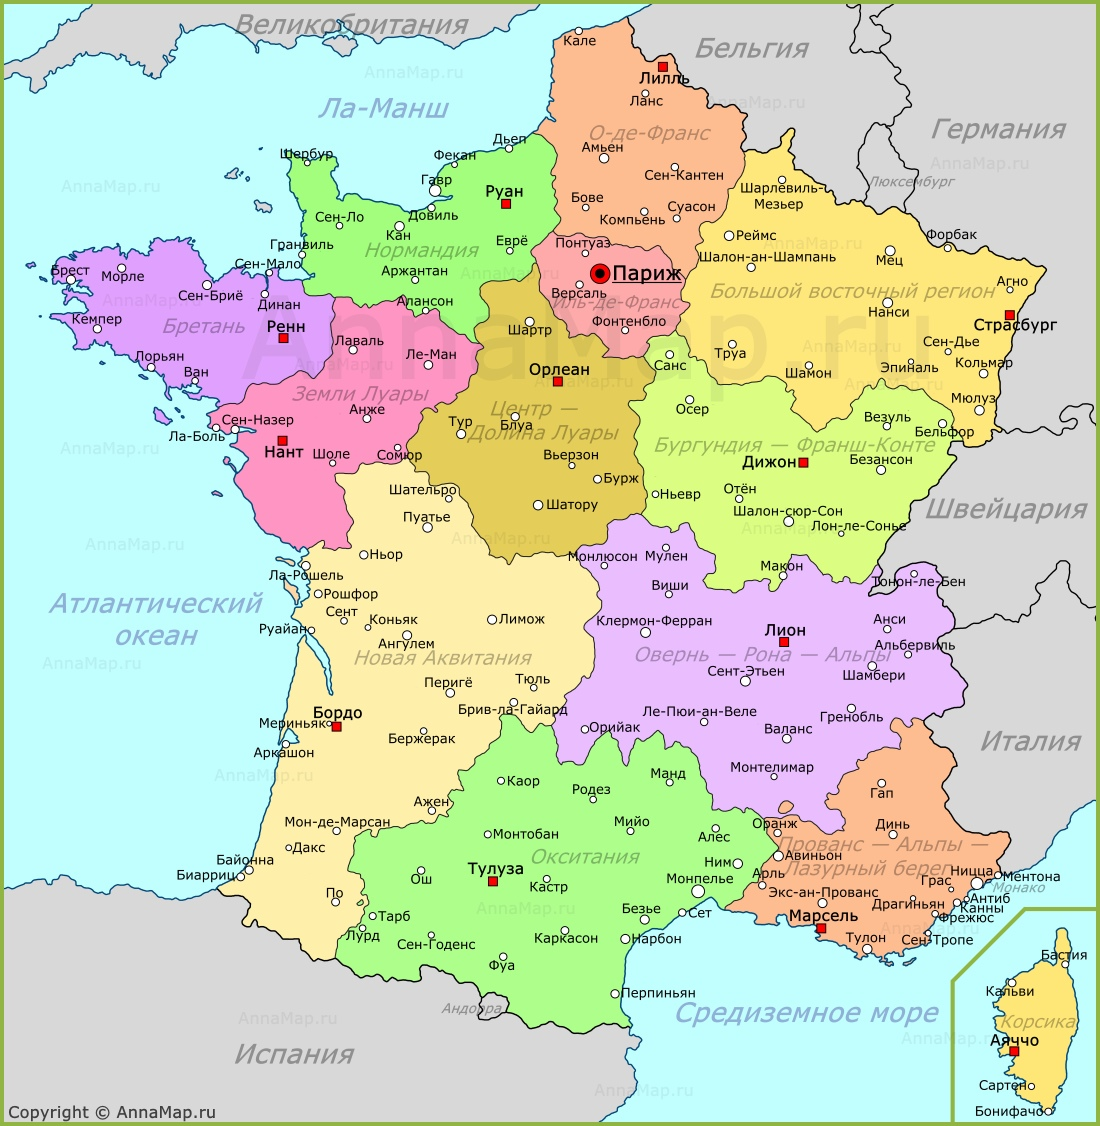 Karta Francii Na Russkom Yazyke Annamap Ru